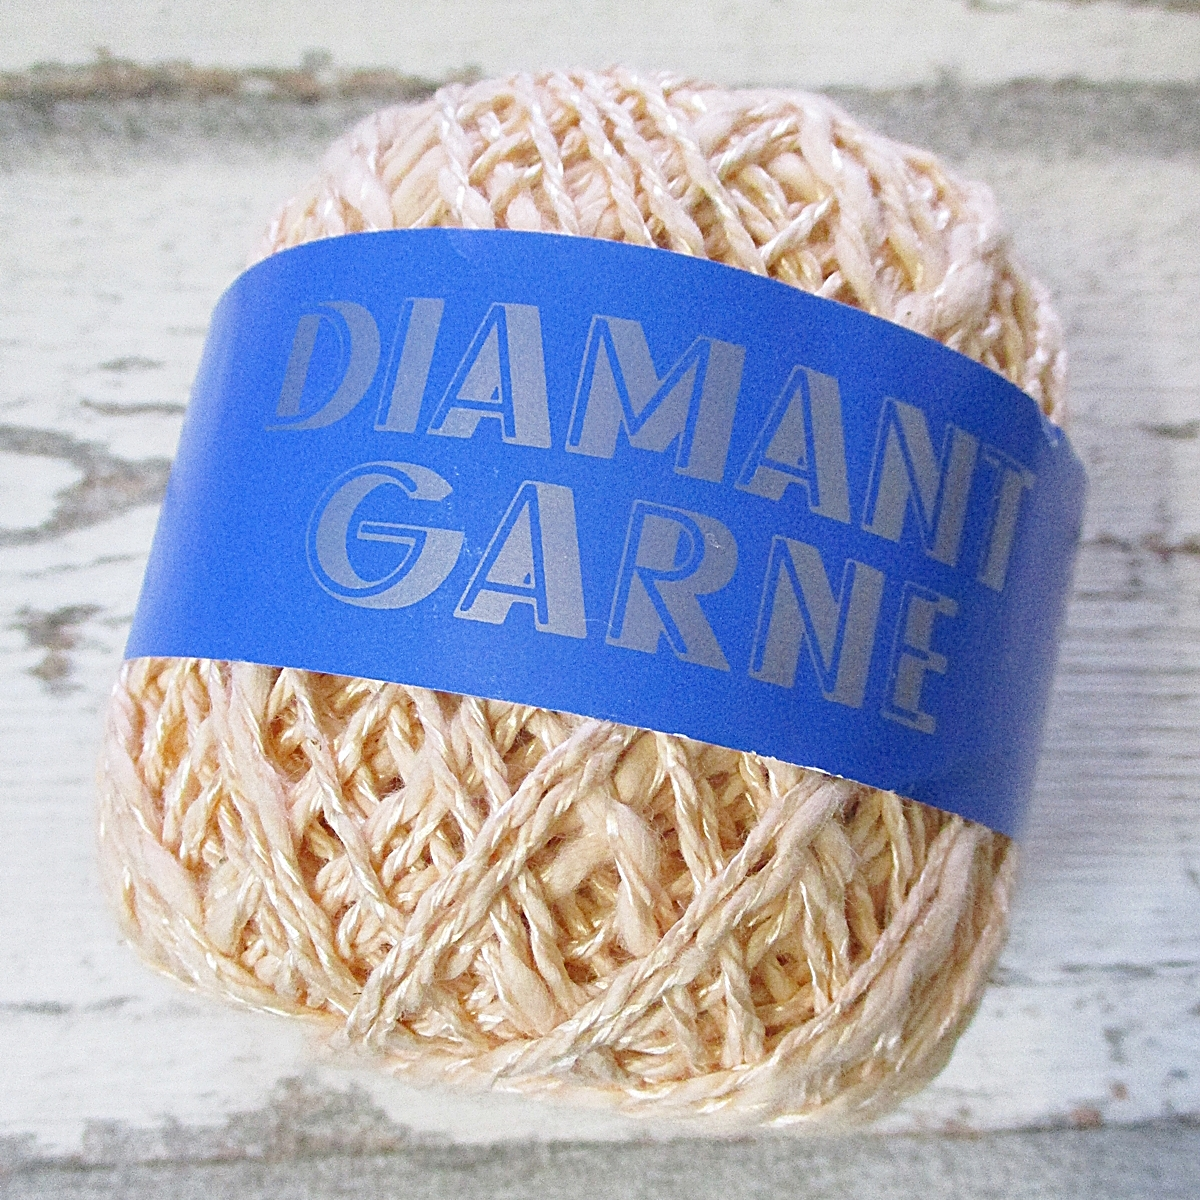 Wolle Diamantgarn Farbe_130 lachsrosa 66umwolle 34%Viskose Seidenglanz